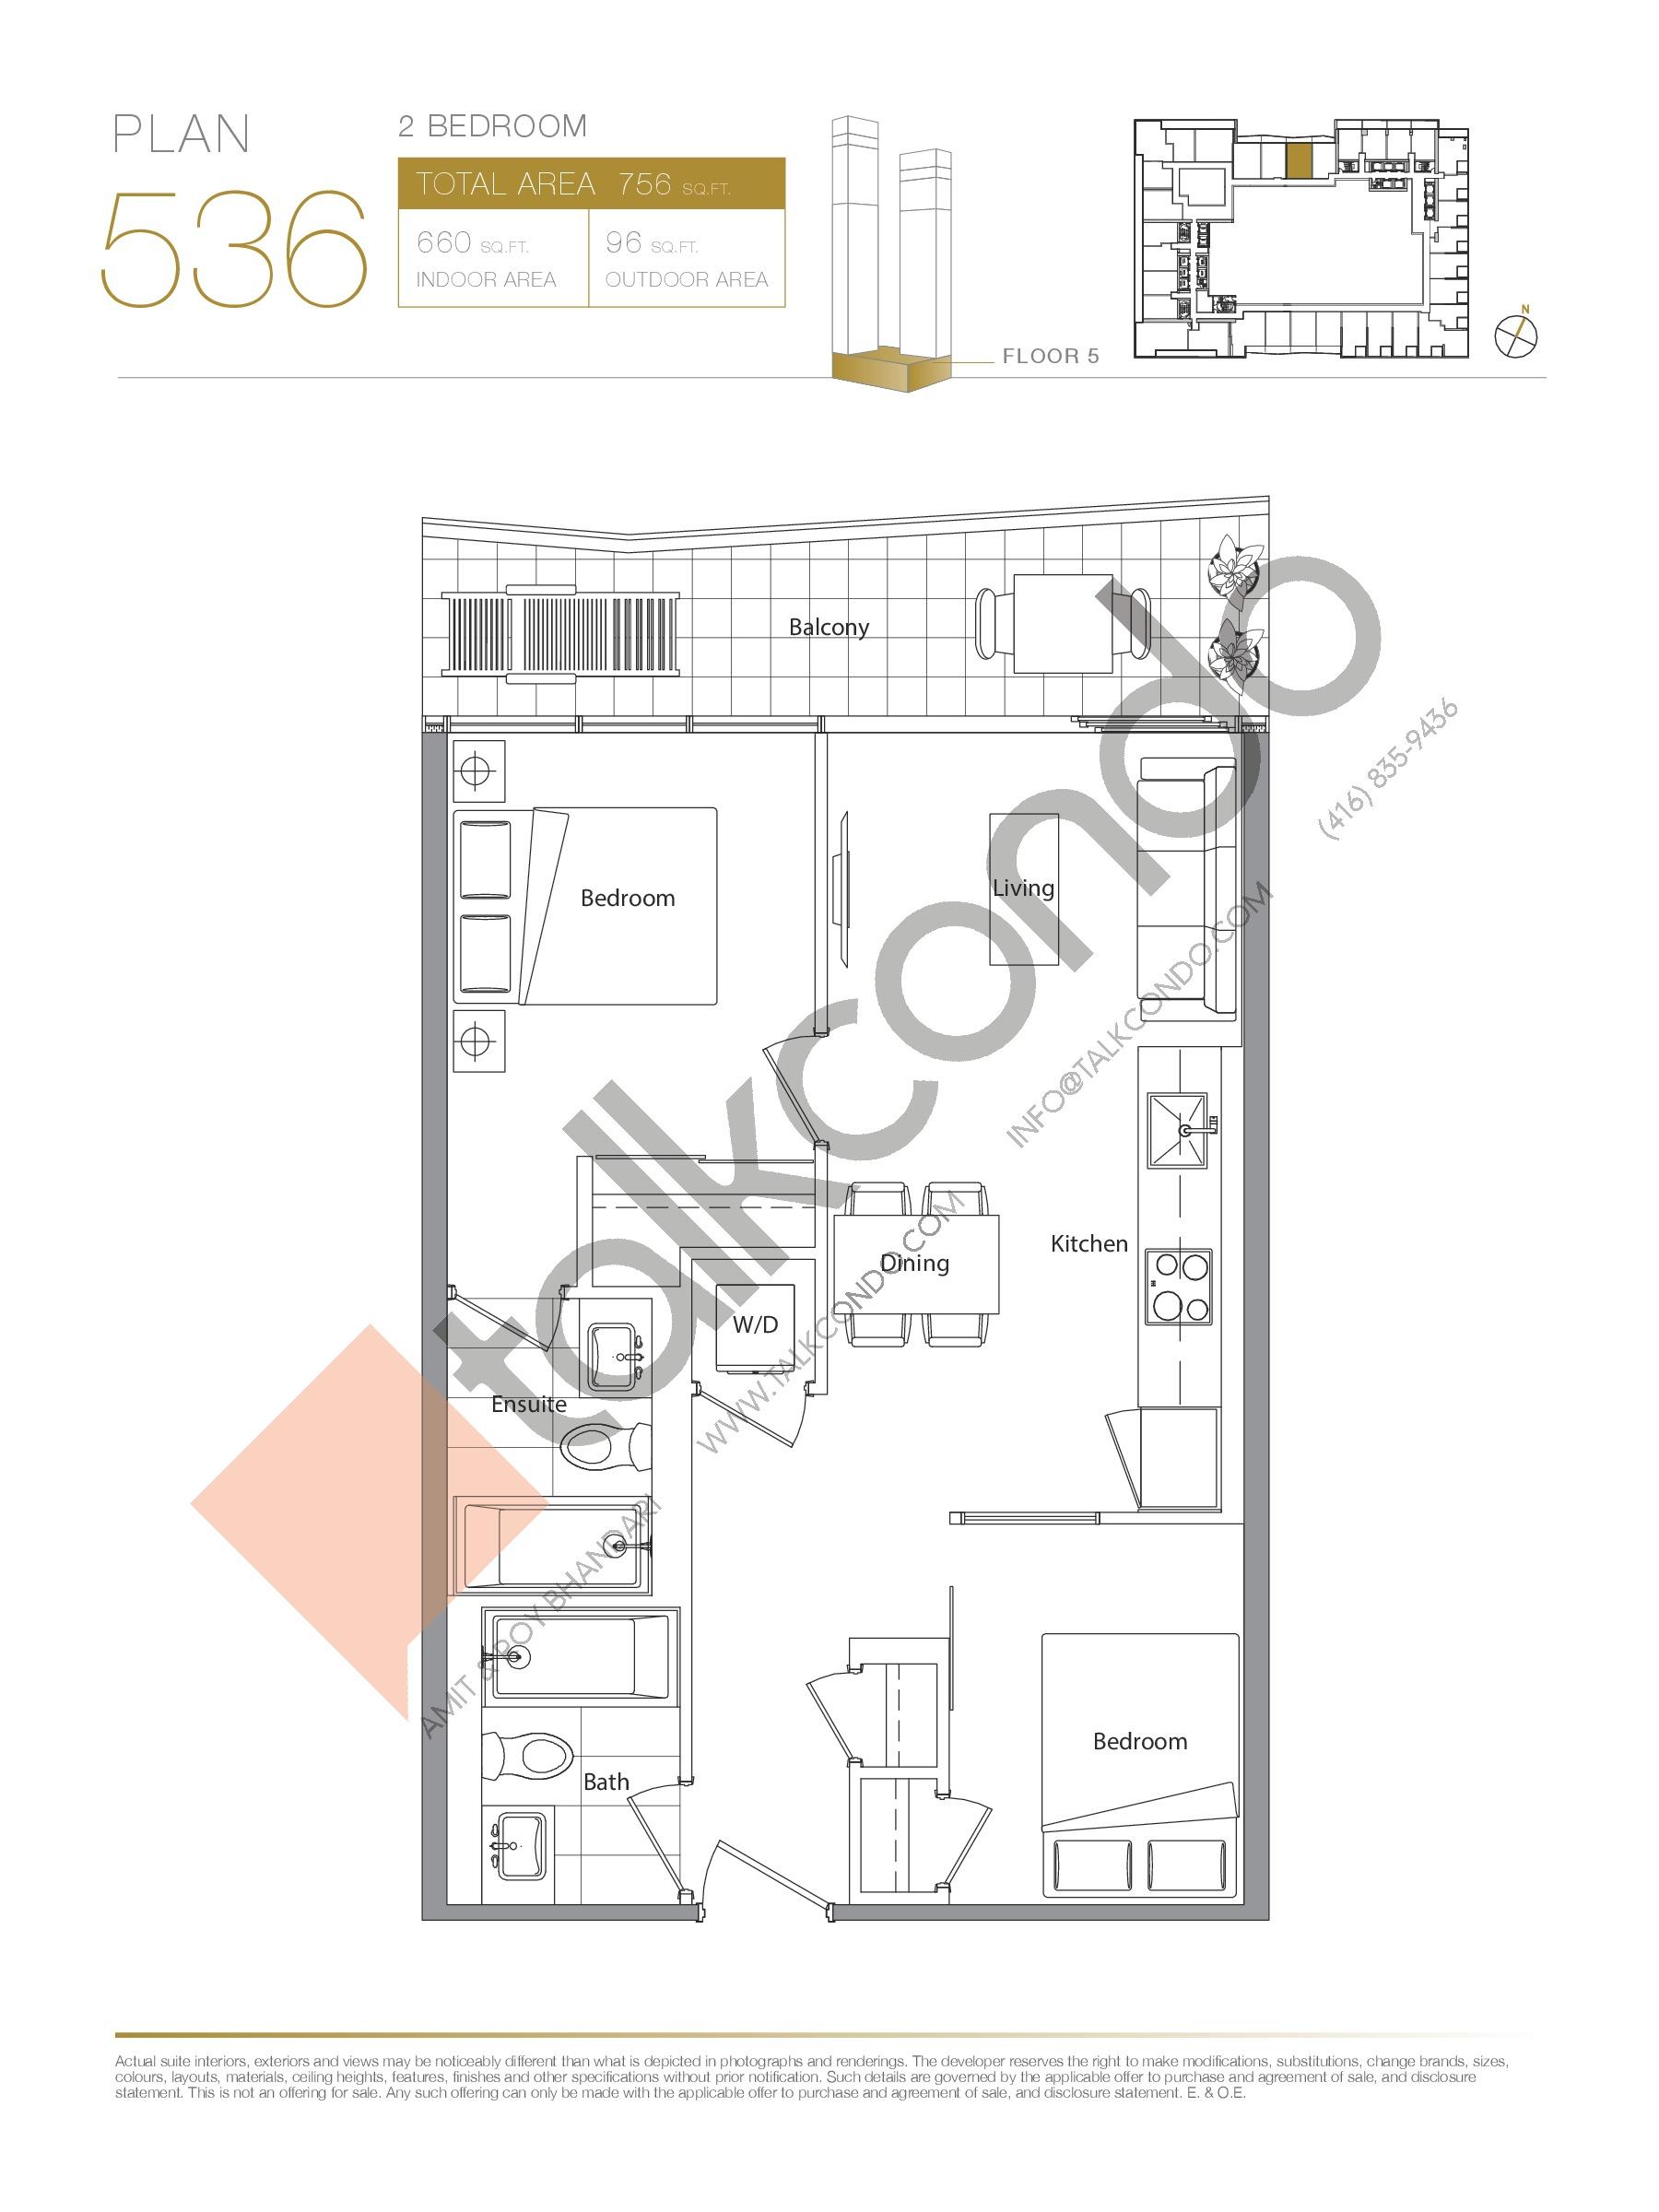 Plan 536 Floor Plan at Concord Canada House Condos - 660 sq.ft